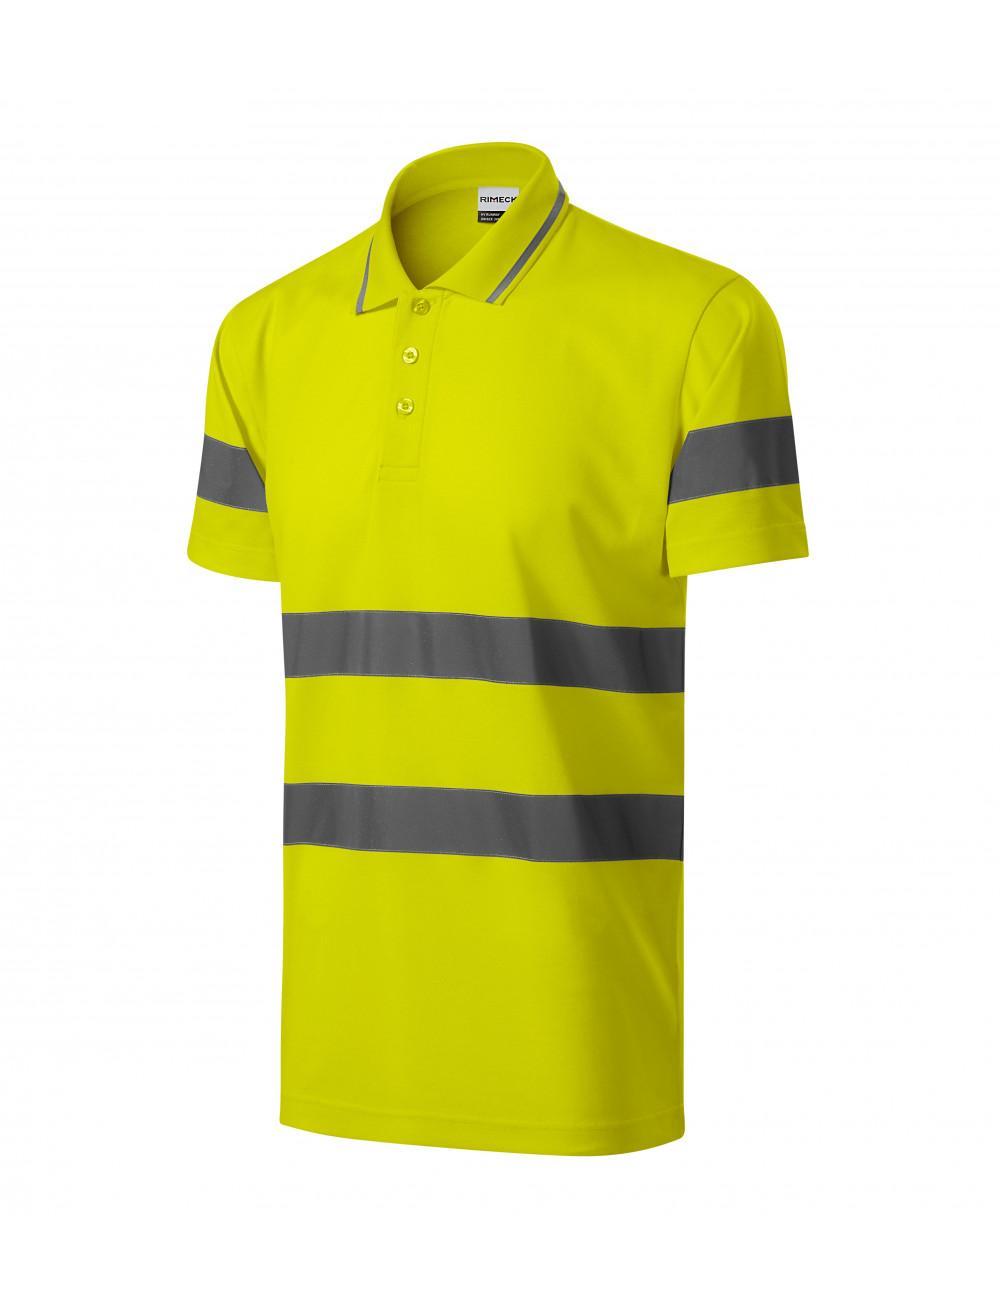 Adler RIMECK Koszulka polo unisex HV Runway 2V9 żółty odblaskowy